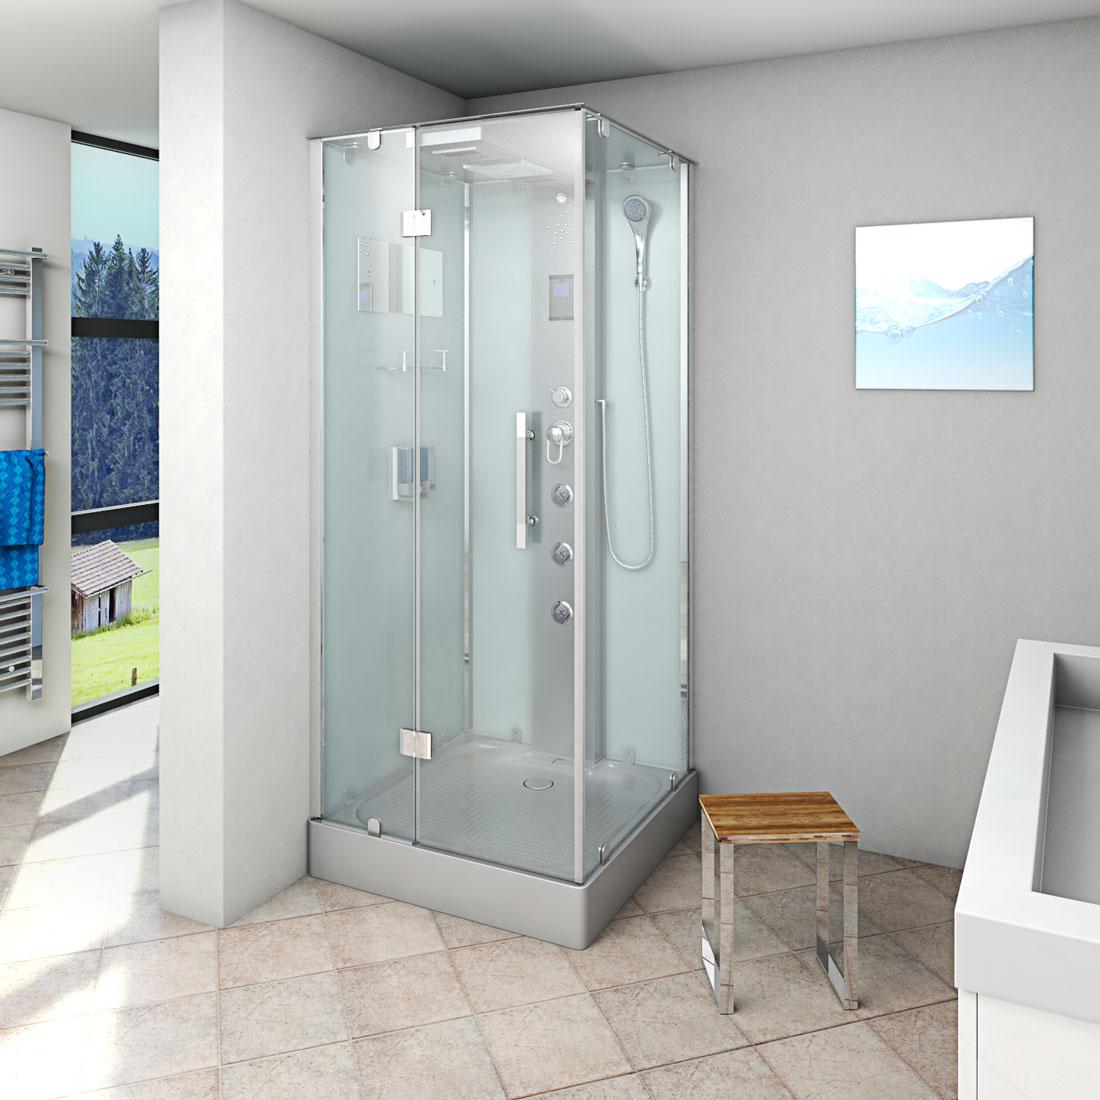 acquavapore dtp6038 3002l dusche dampfdusche duschtempel duschkabine 90x90 ebay. Black Bedroom Furniture Sets. Home Design Ideas